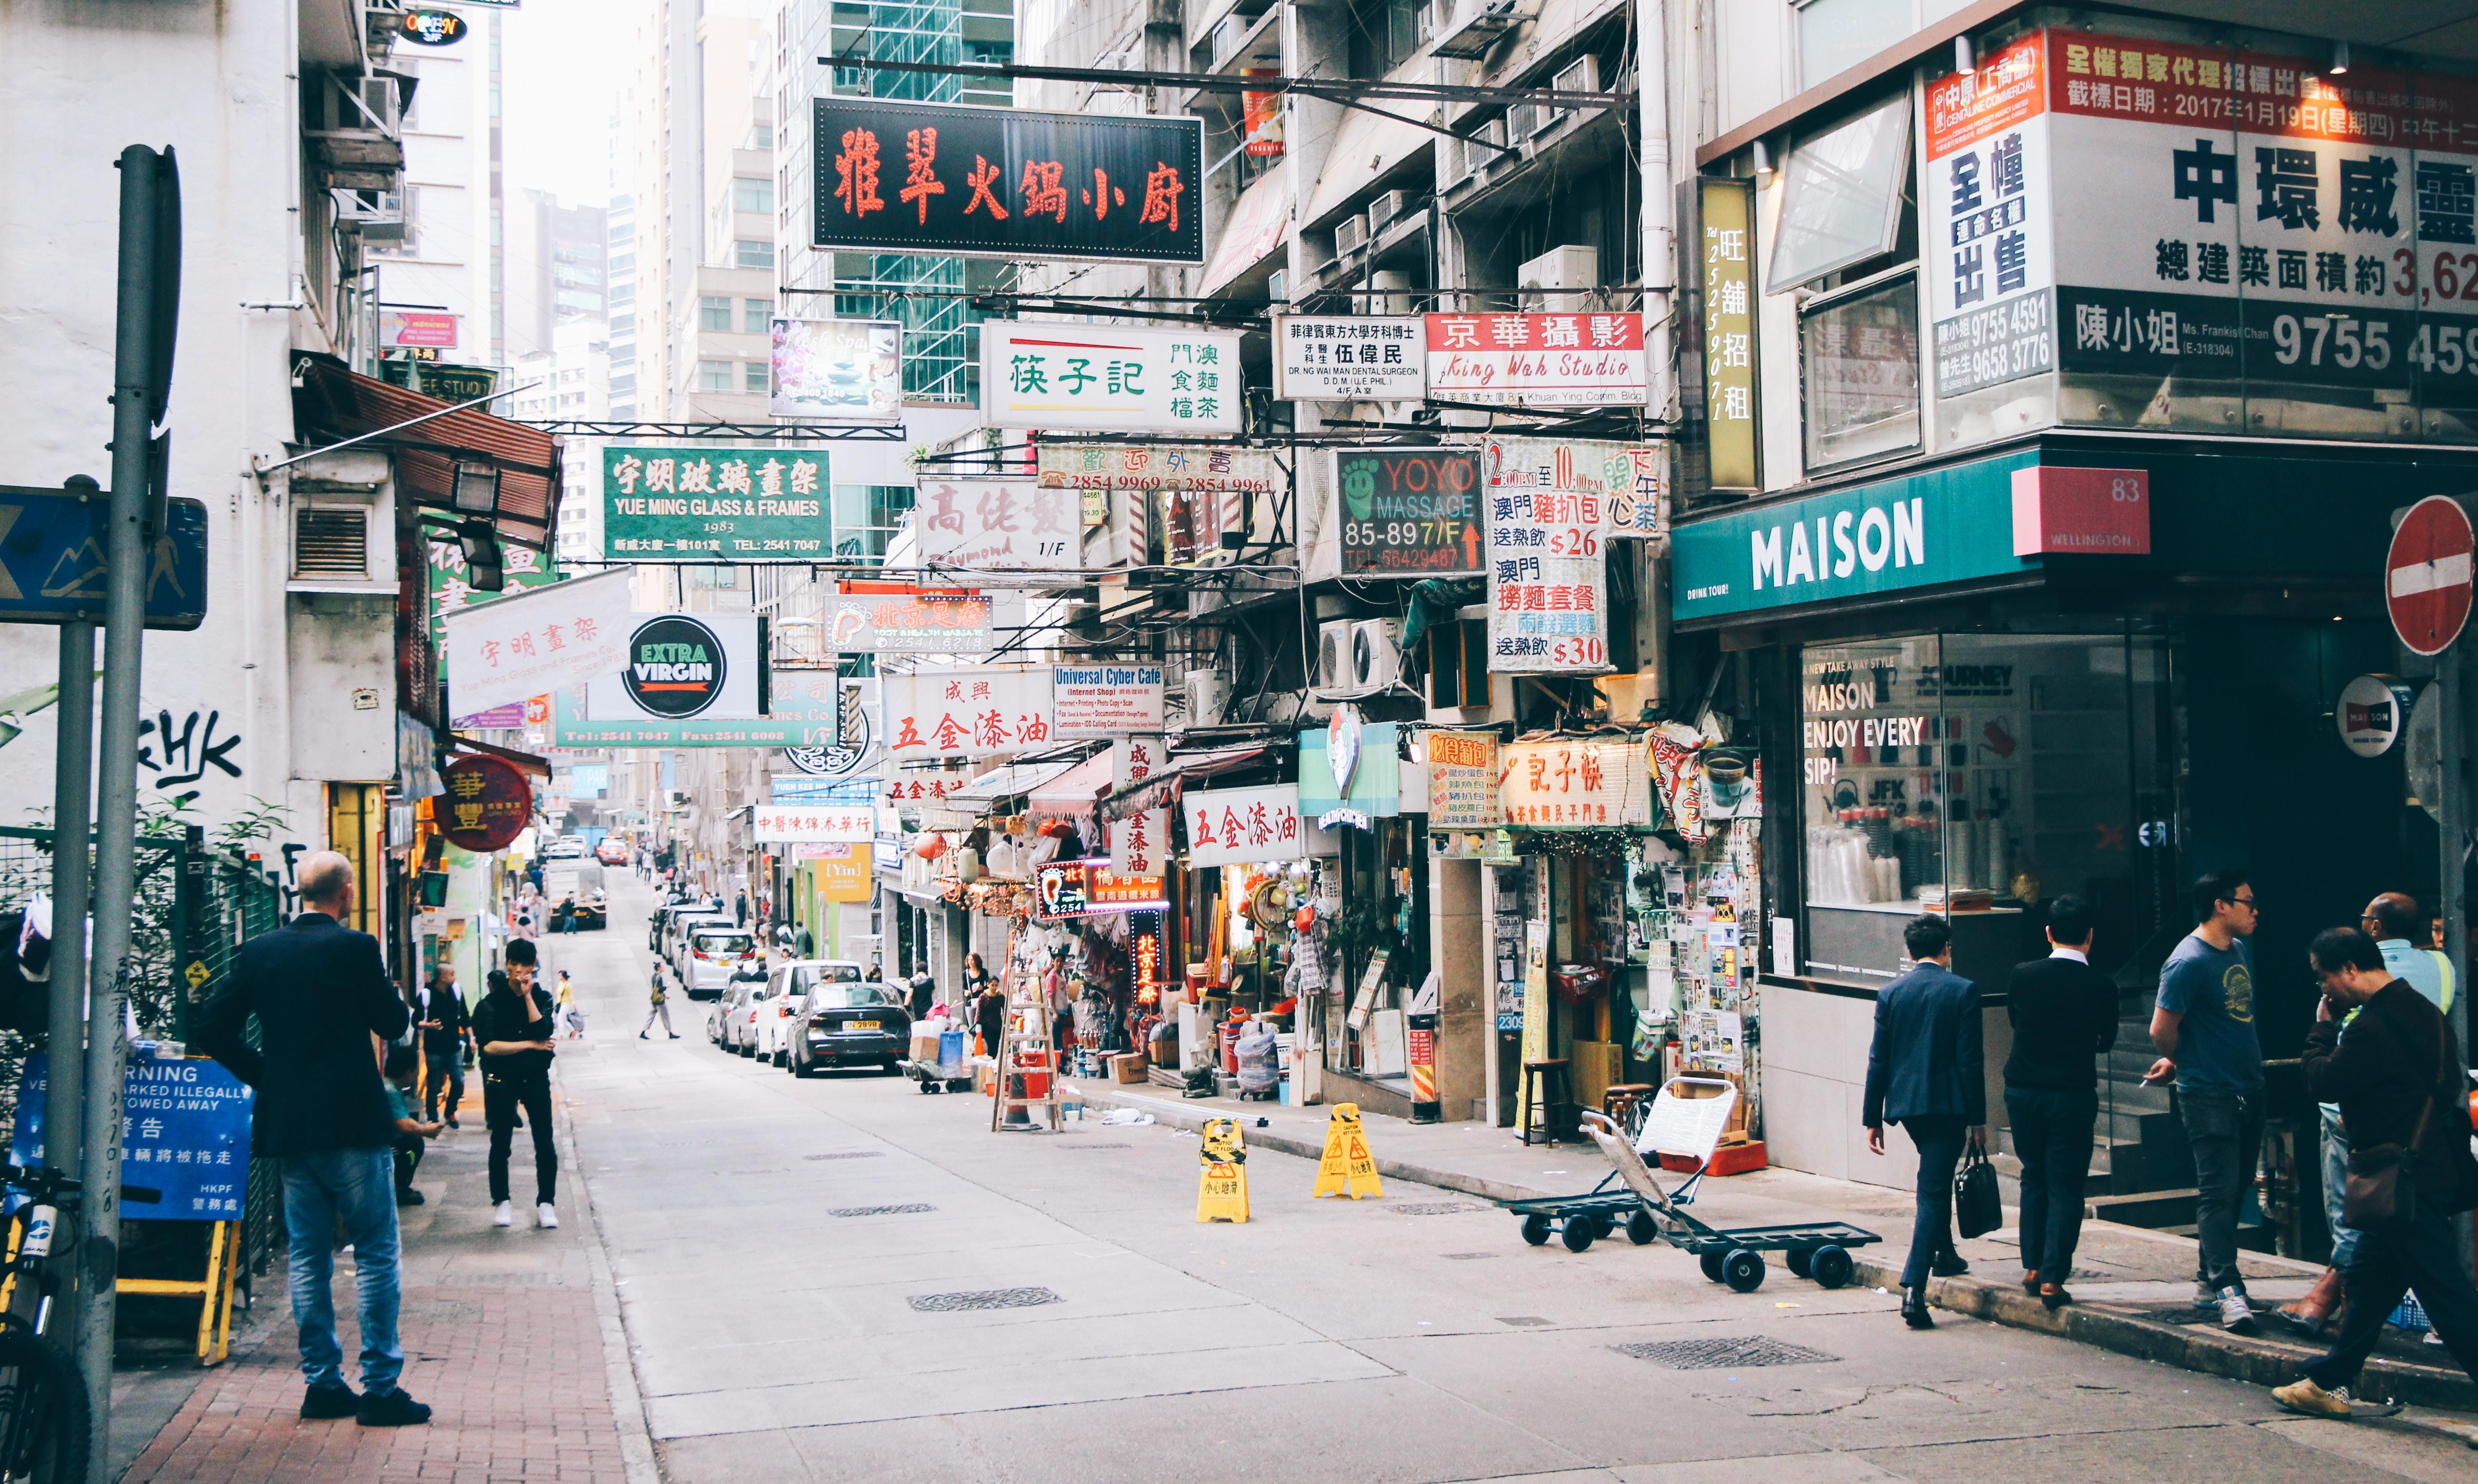 people on sidewalk during daytime